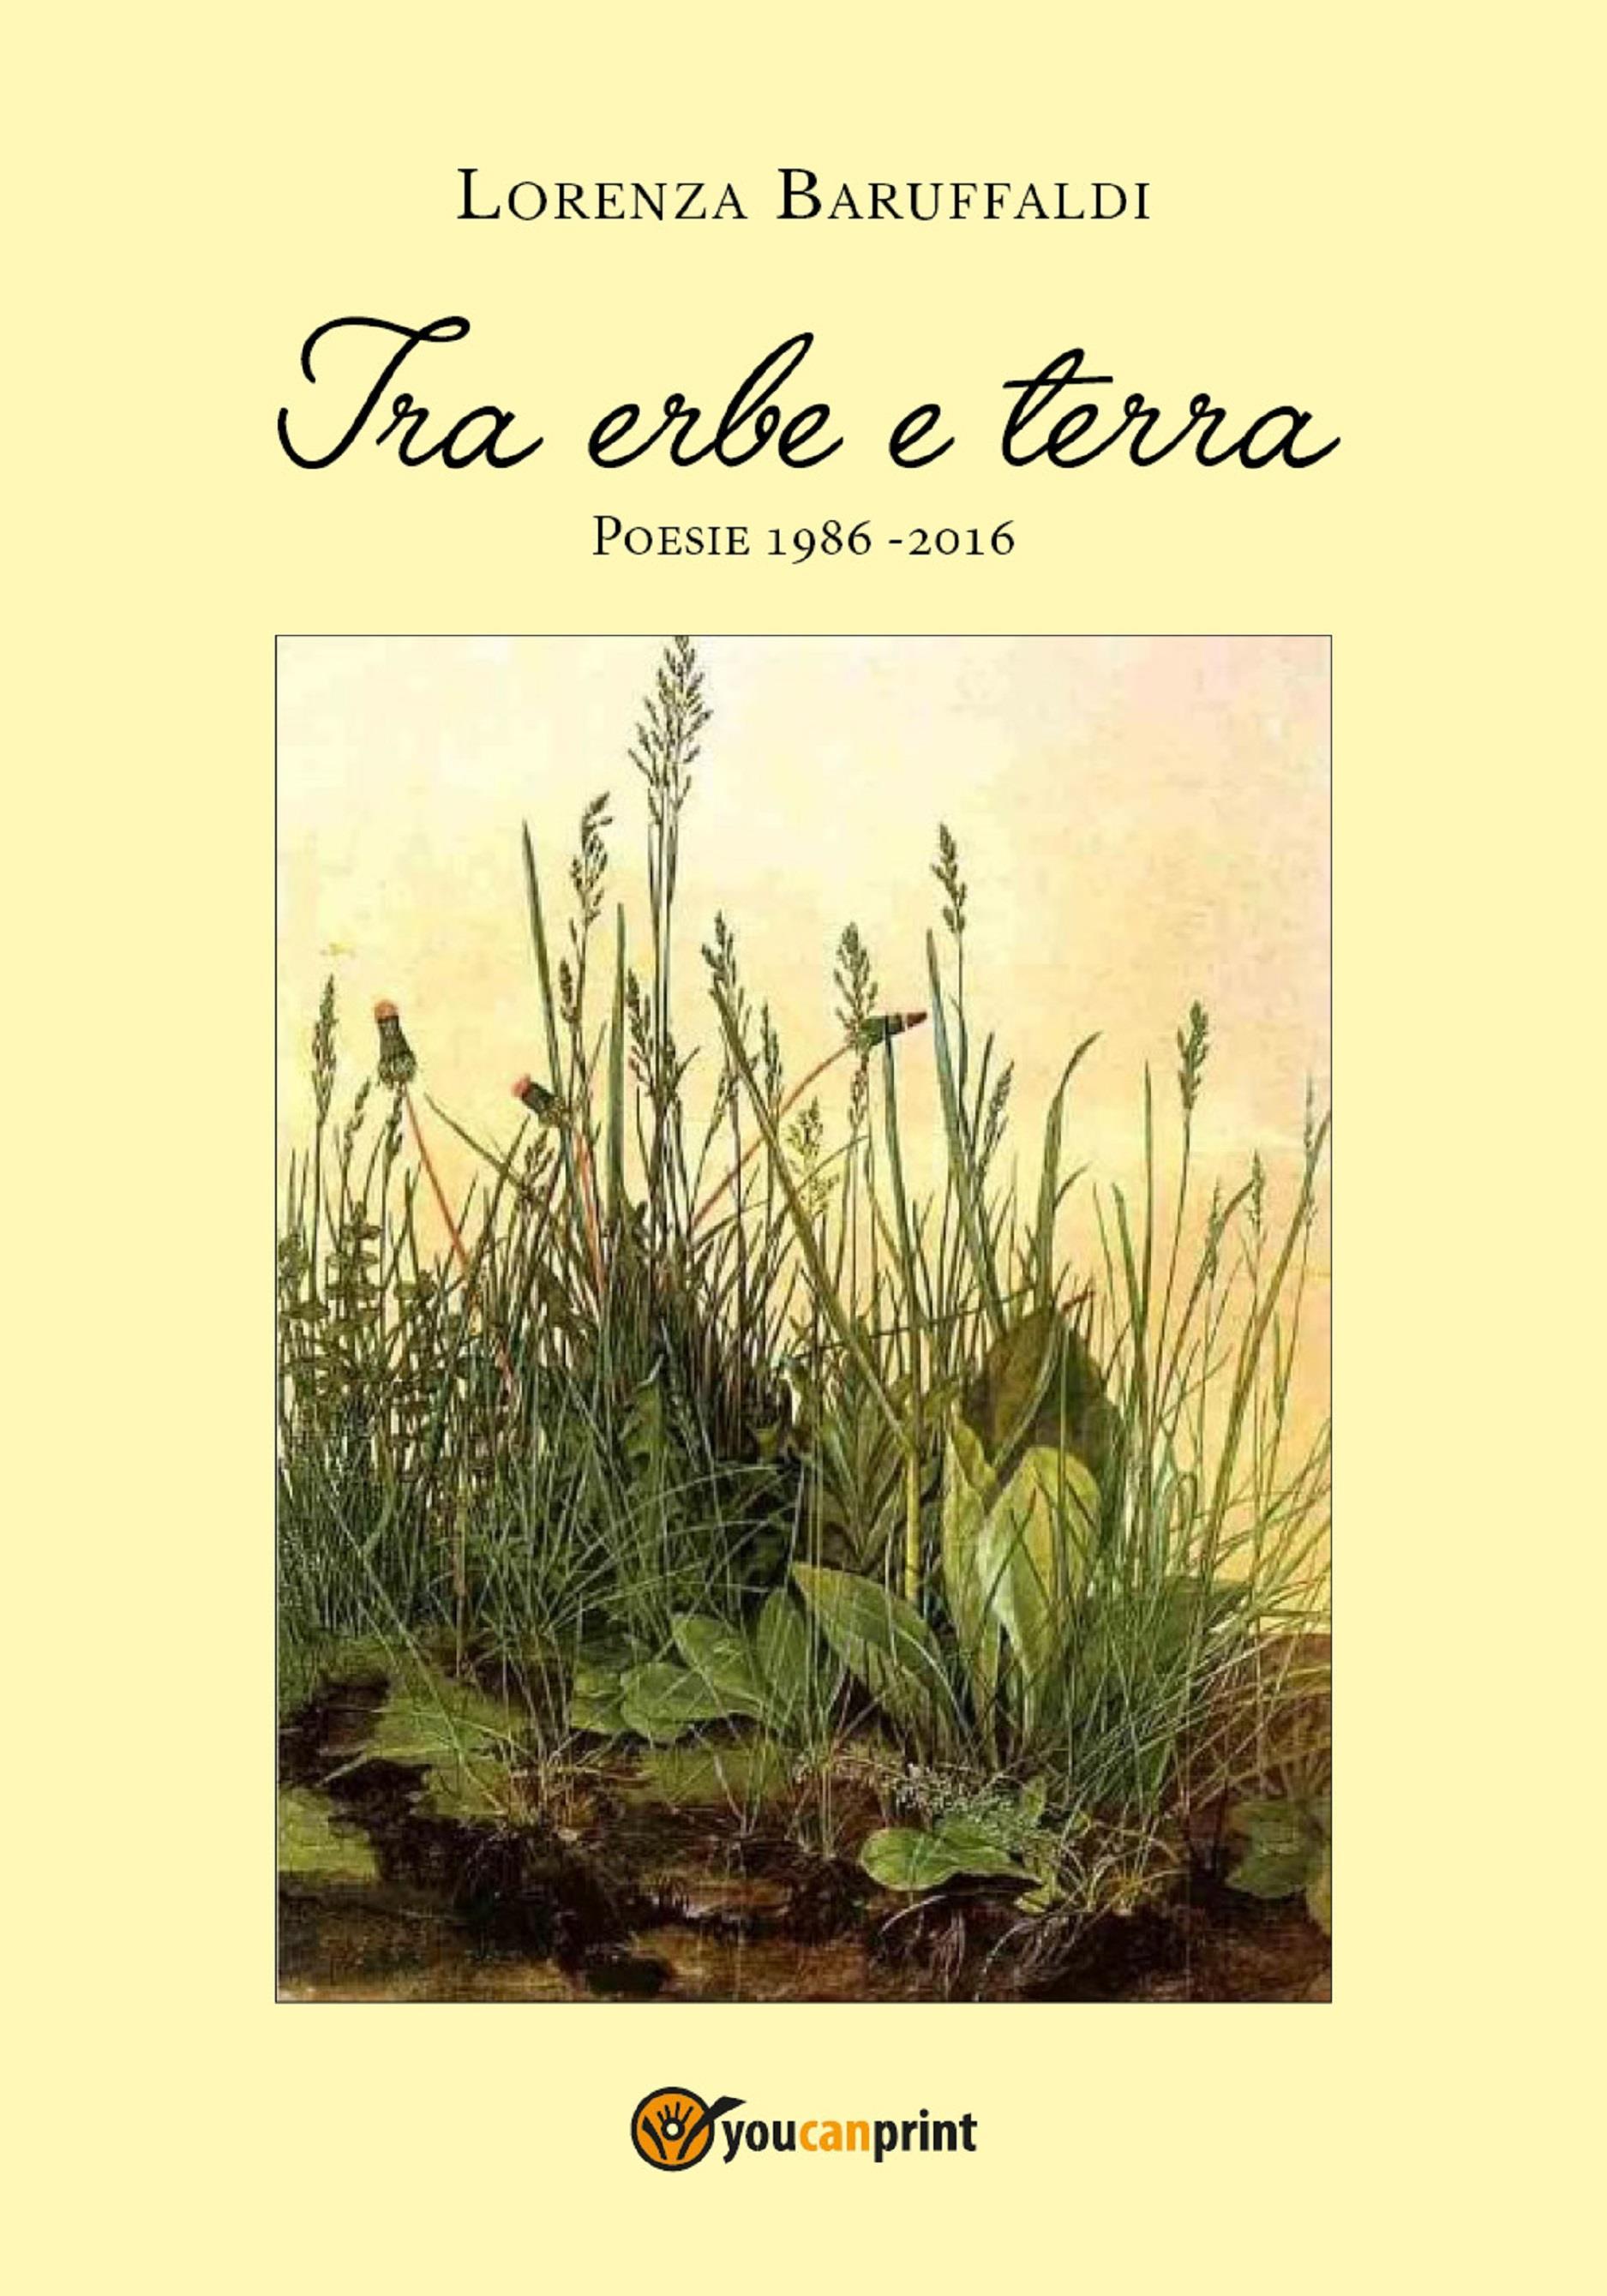 Tra erbe e terra